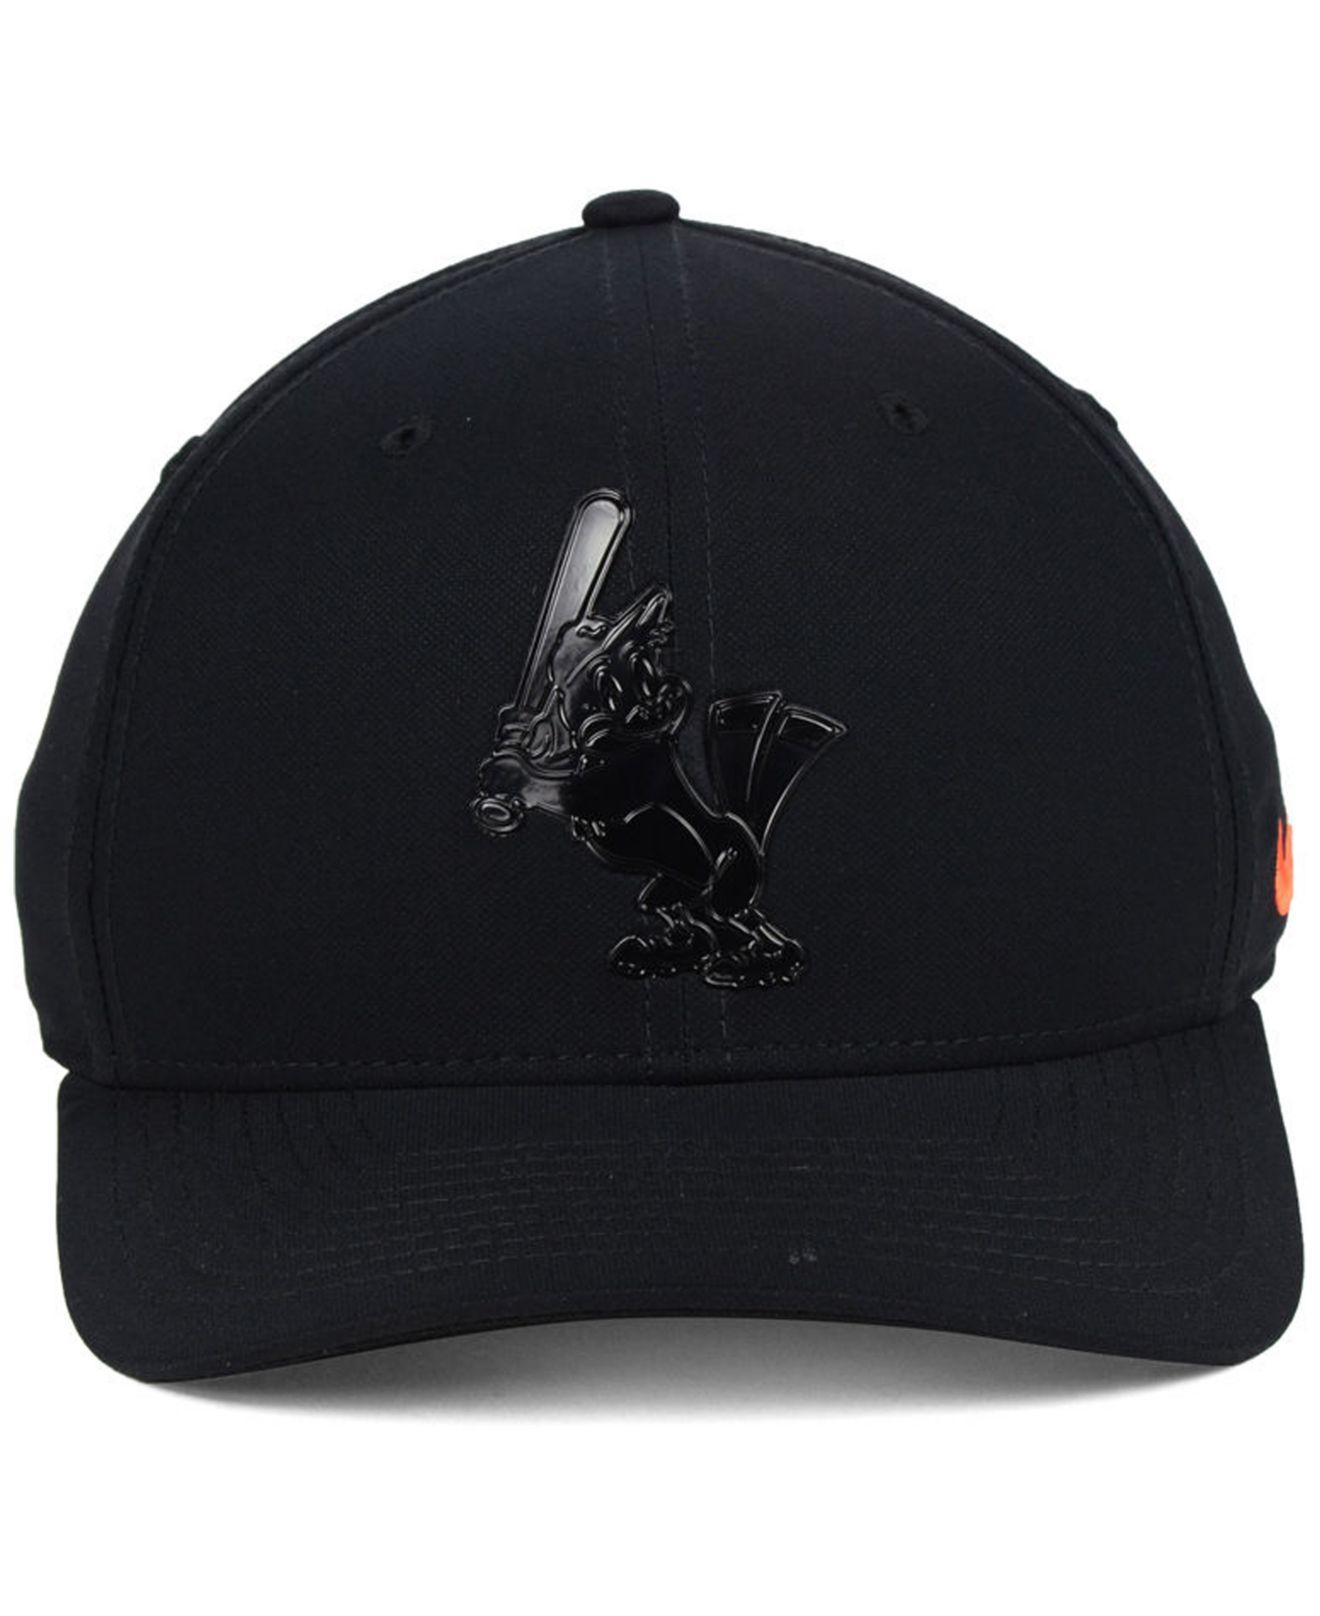 cd5df55c9ece8 Lyst - Nike Baltimore Orioles Gloss Swooshflex Cap in Black for Men